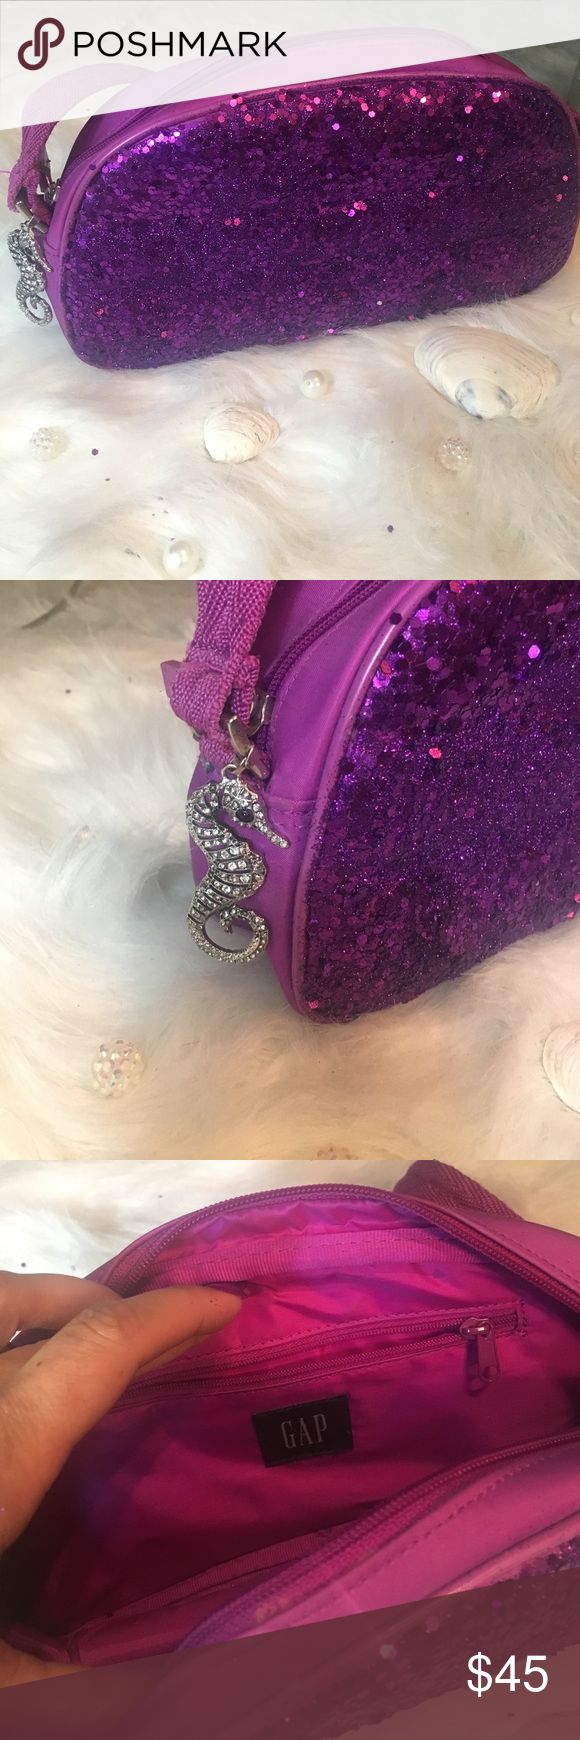 Gap Purse •Authentic Gap Purse •Beautiful purple sequins and glitter • gorgeous seahorse accent •perfect summer bag GAP Bags Shoulder Bags